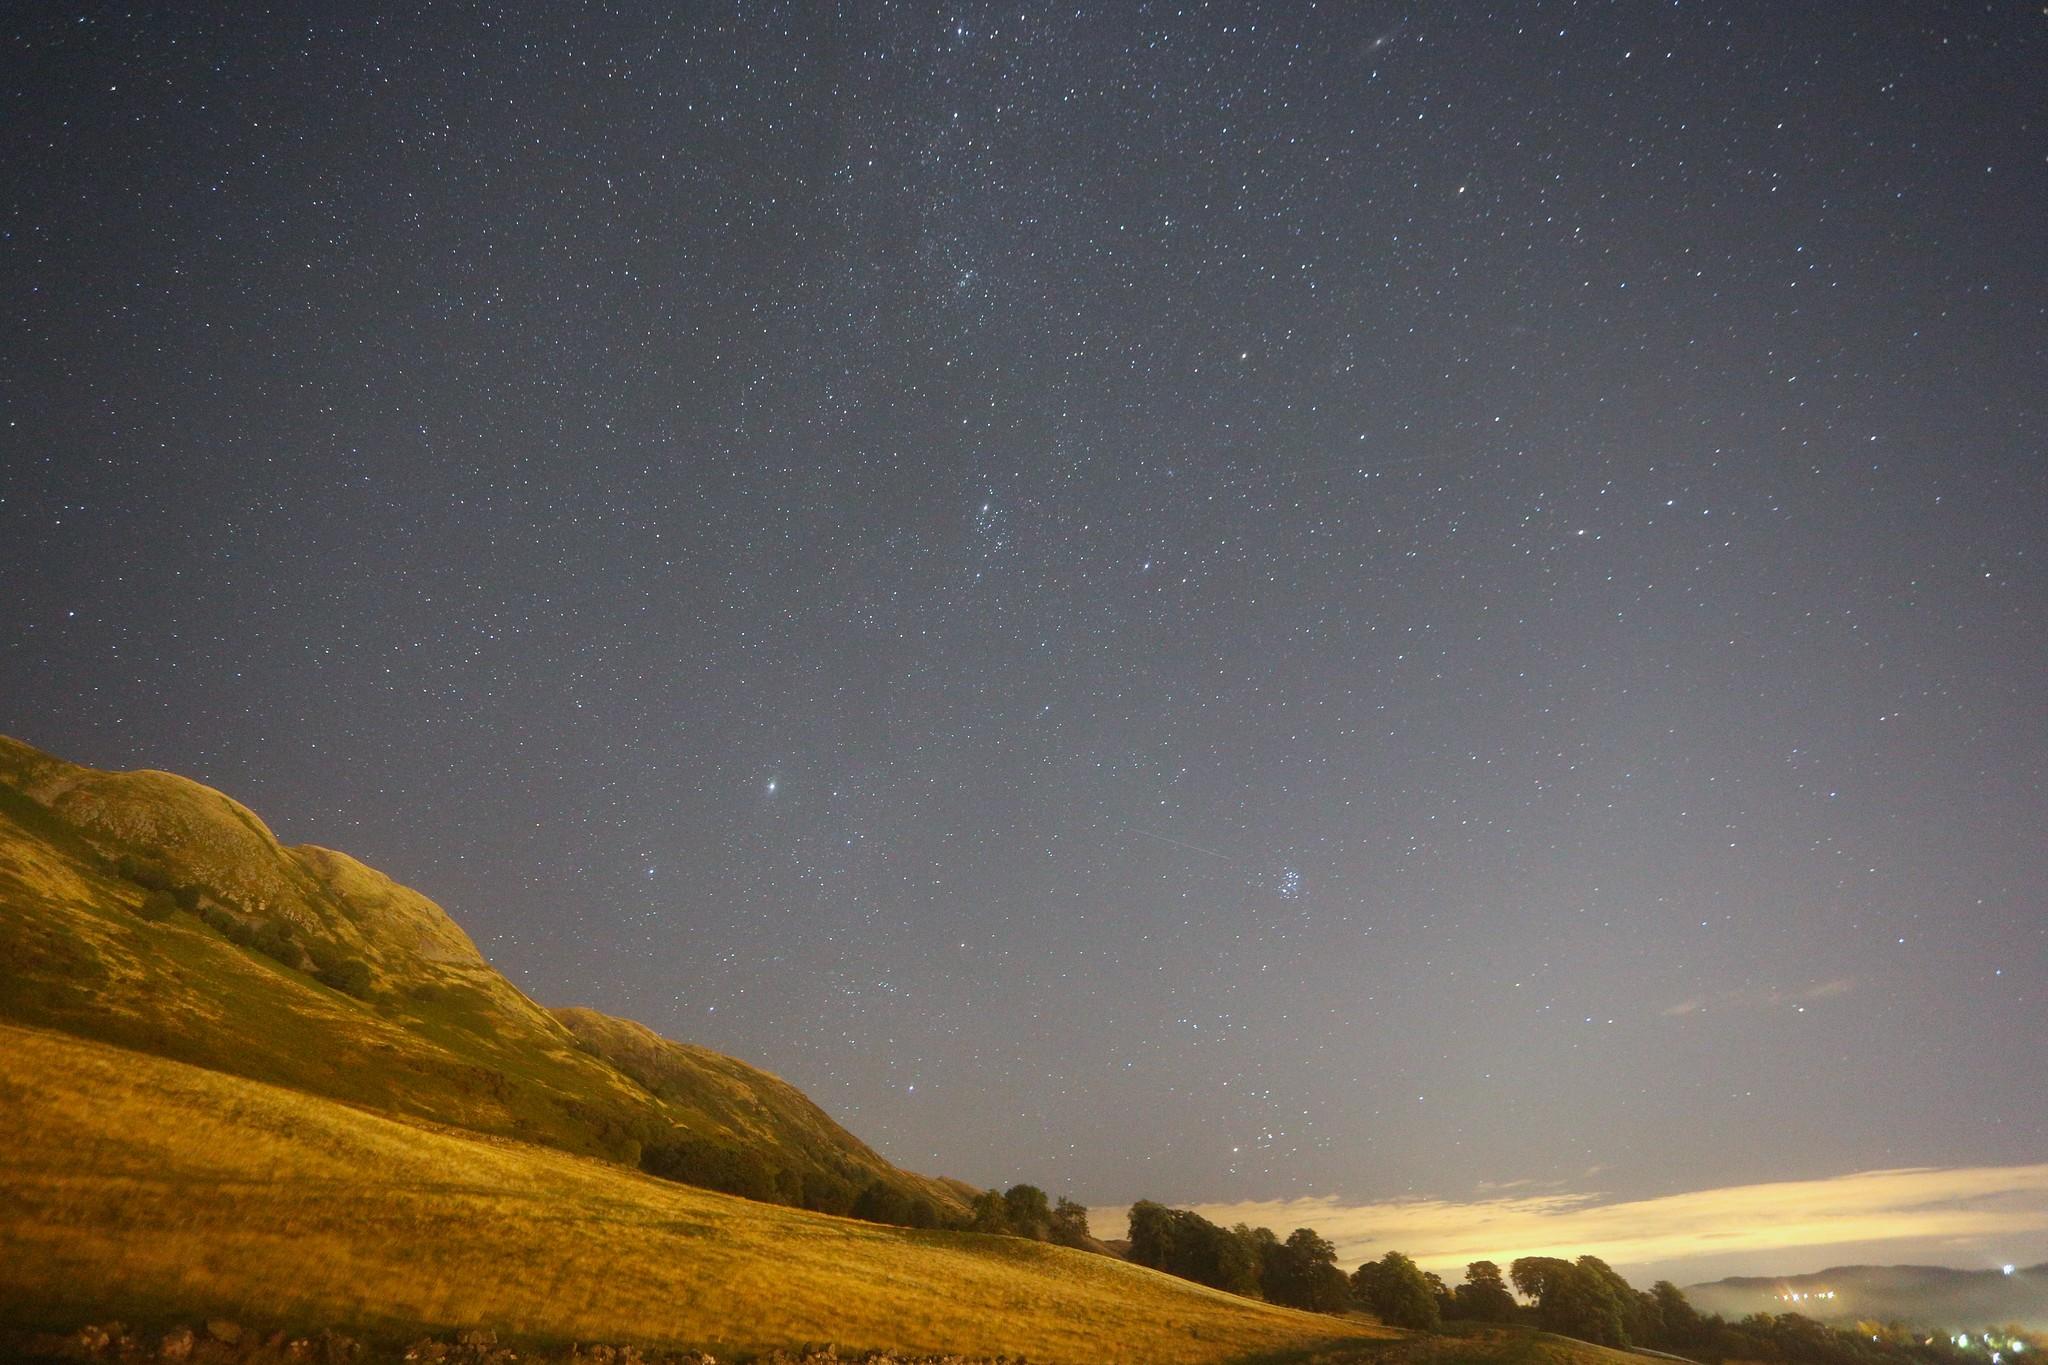 Milky Way, Pleiades and Auriga